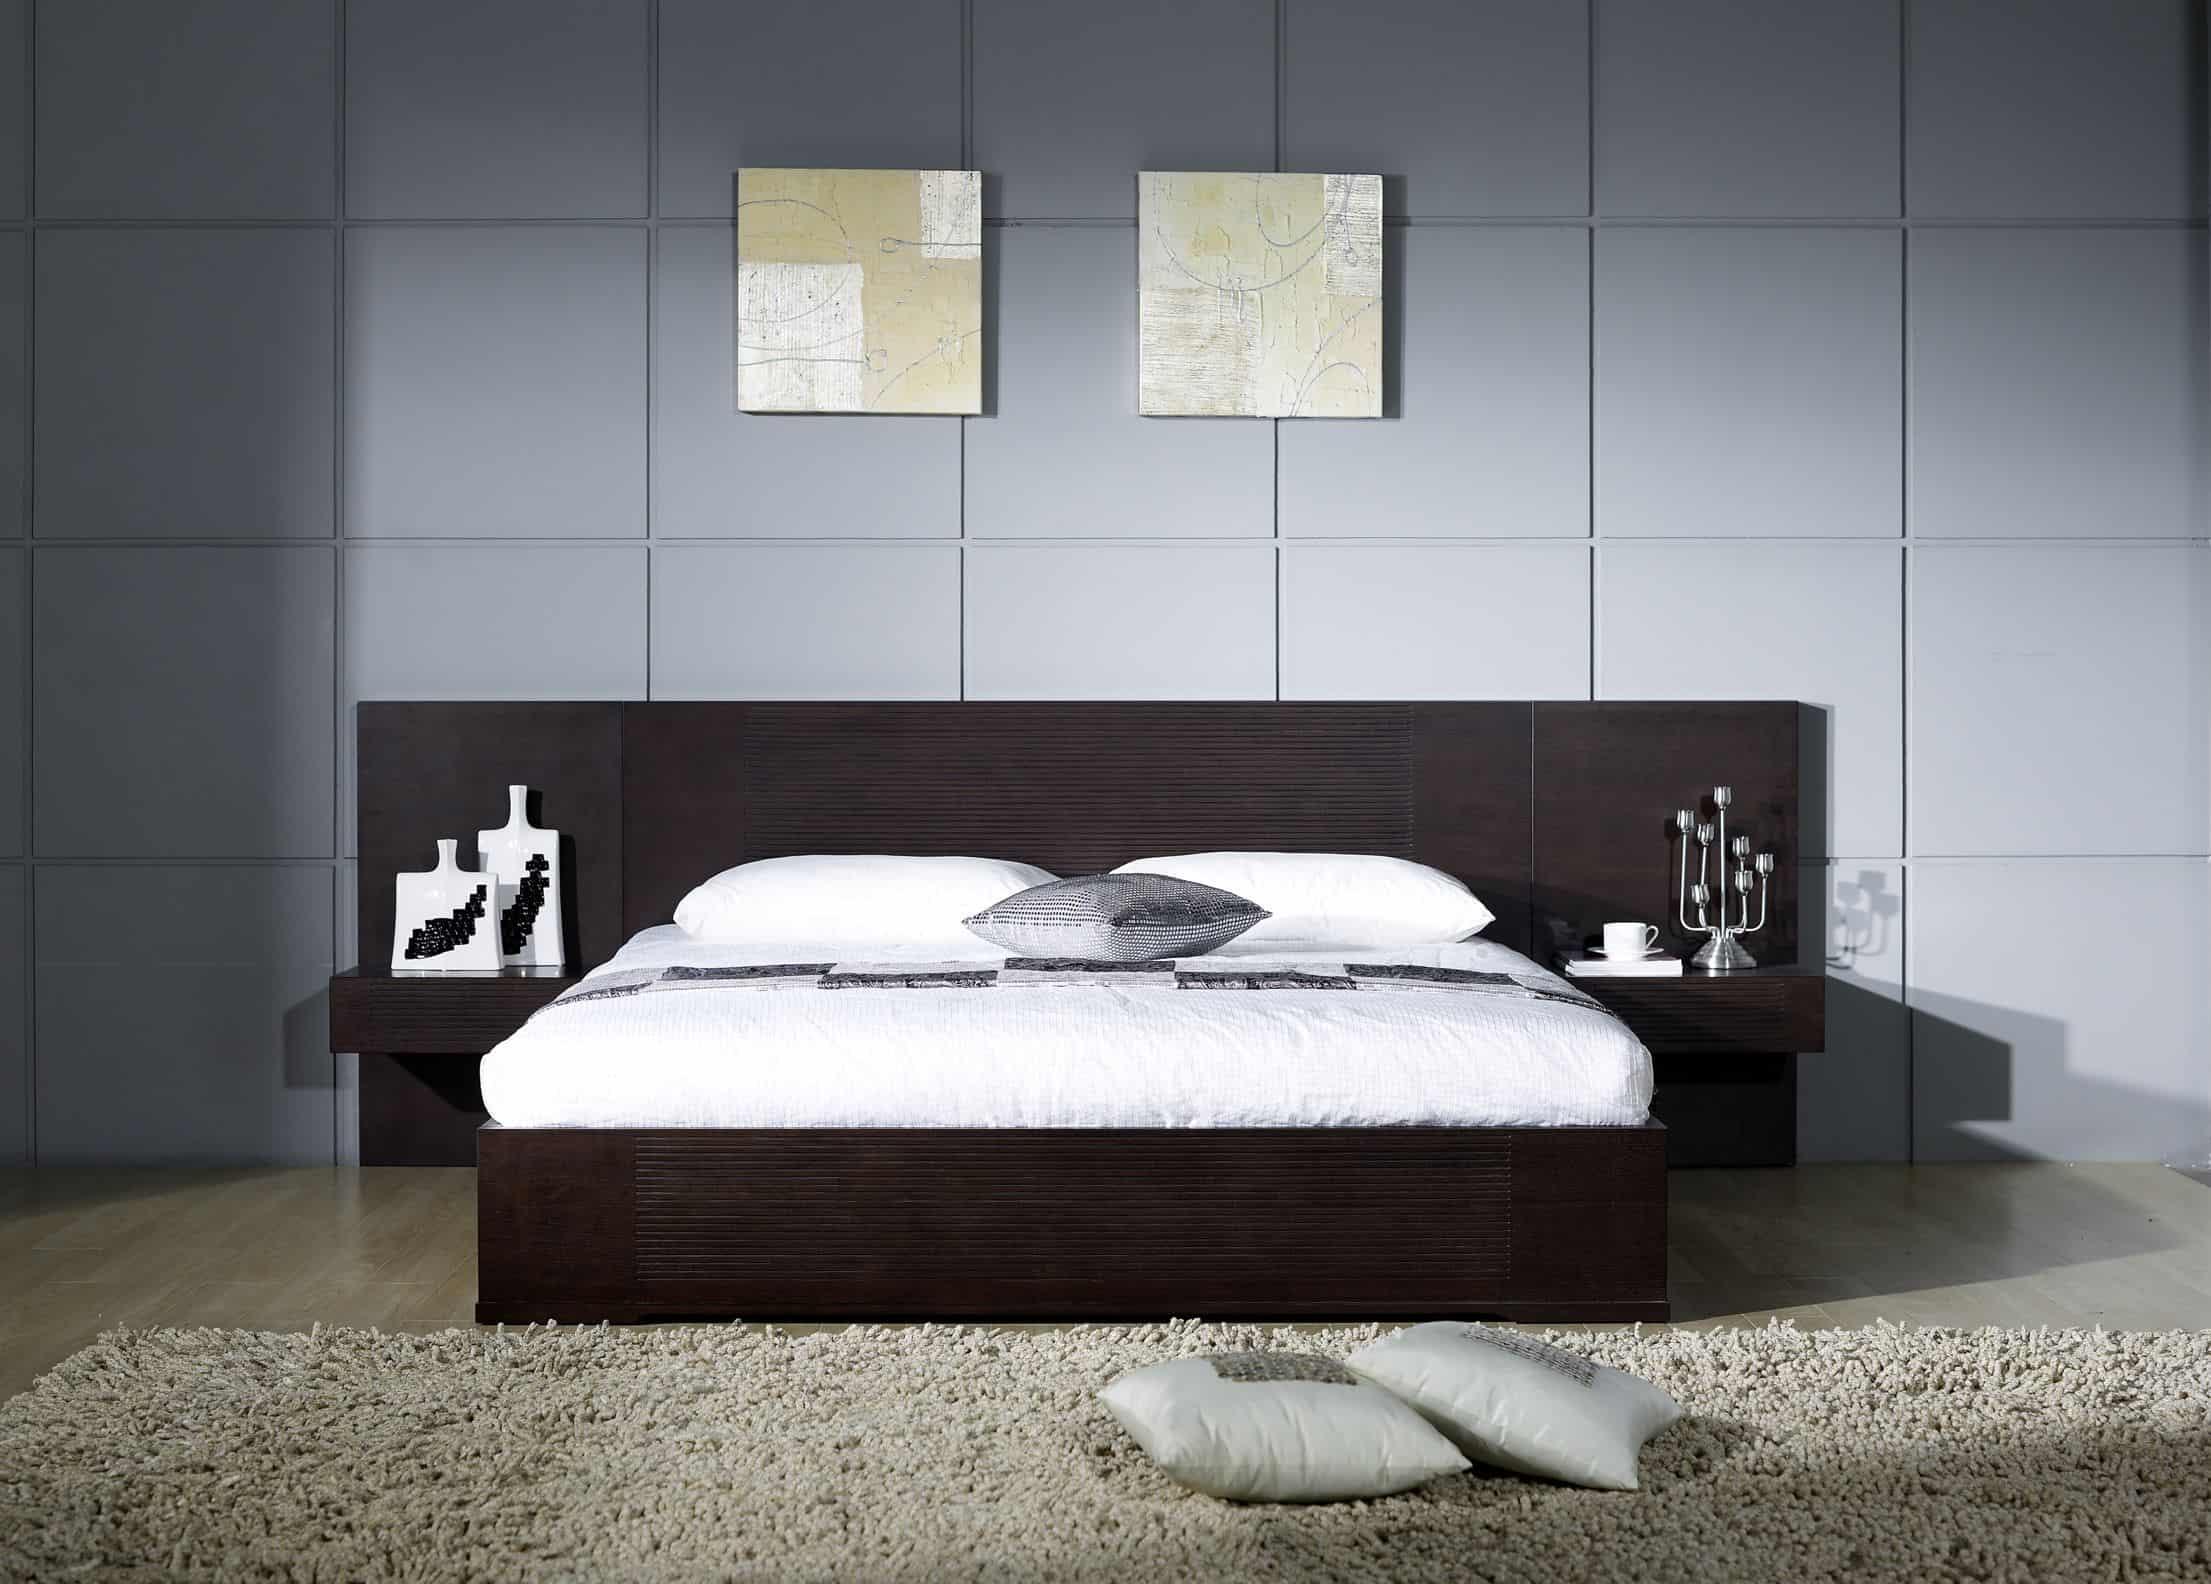 captivating-contemporary-platform-bedroom-sets-modern-bedroom-modern-bedroom-sets-d-amp-s-furniture-bedroom-sets